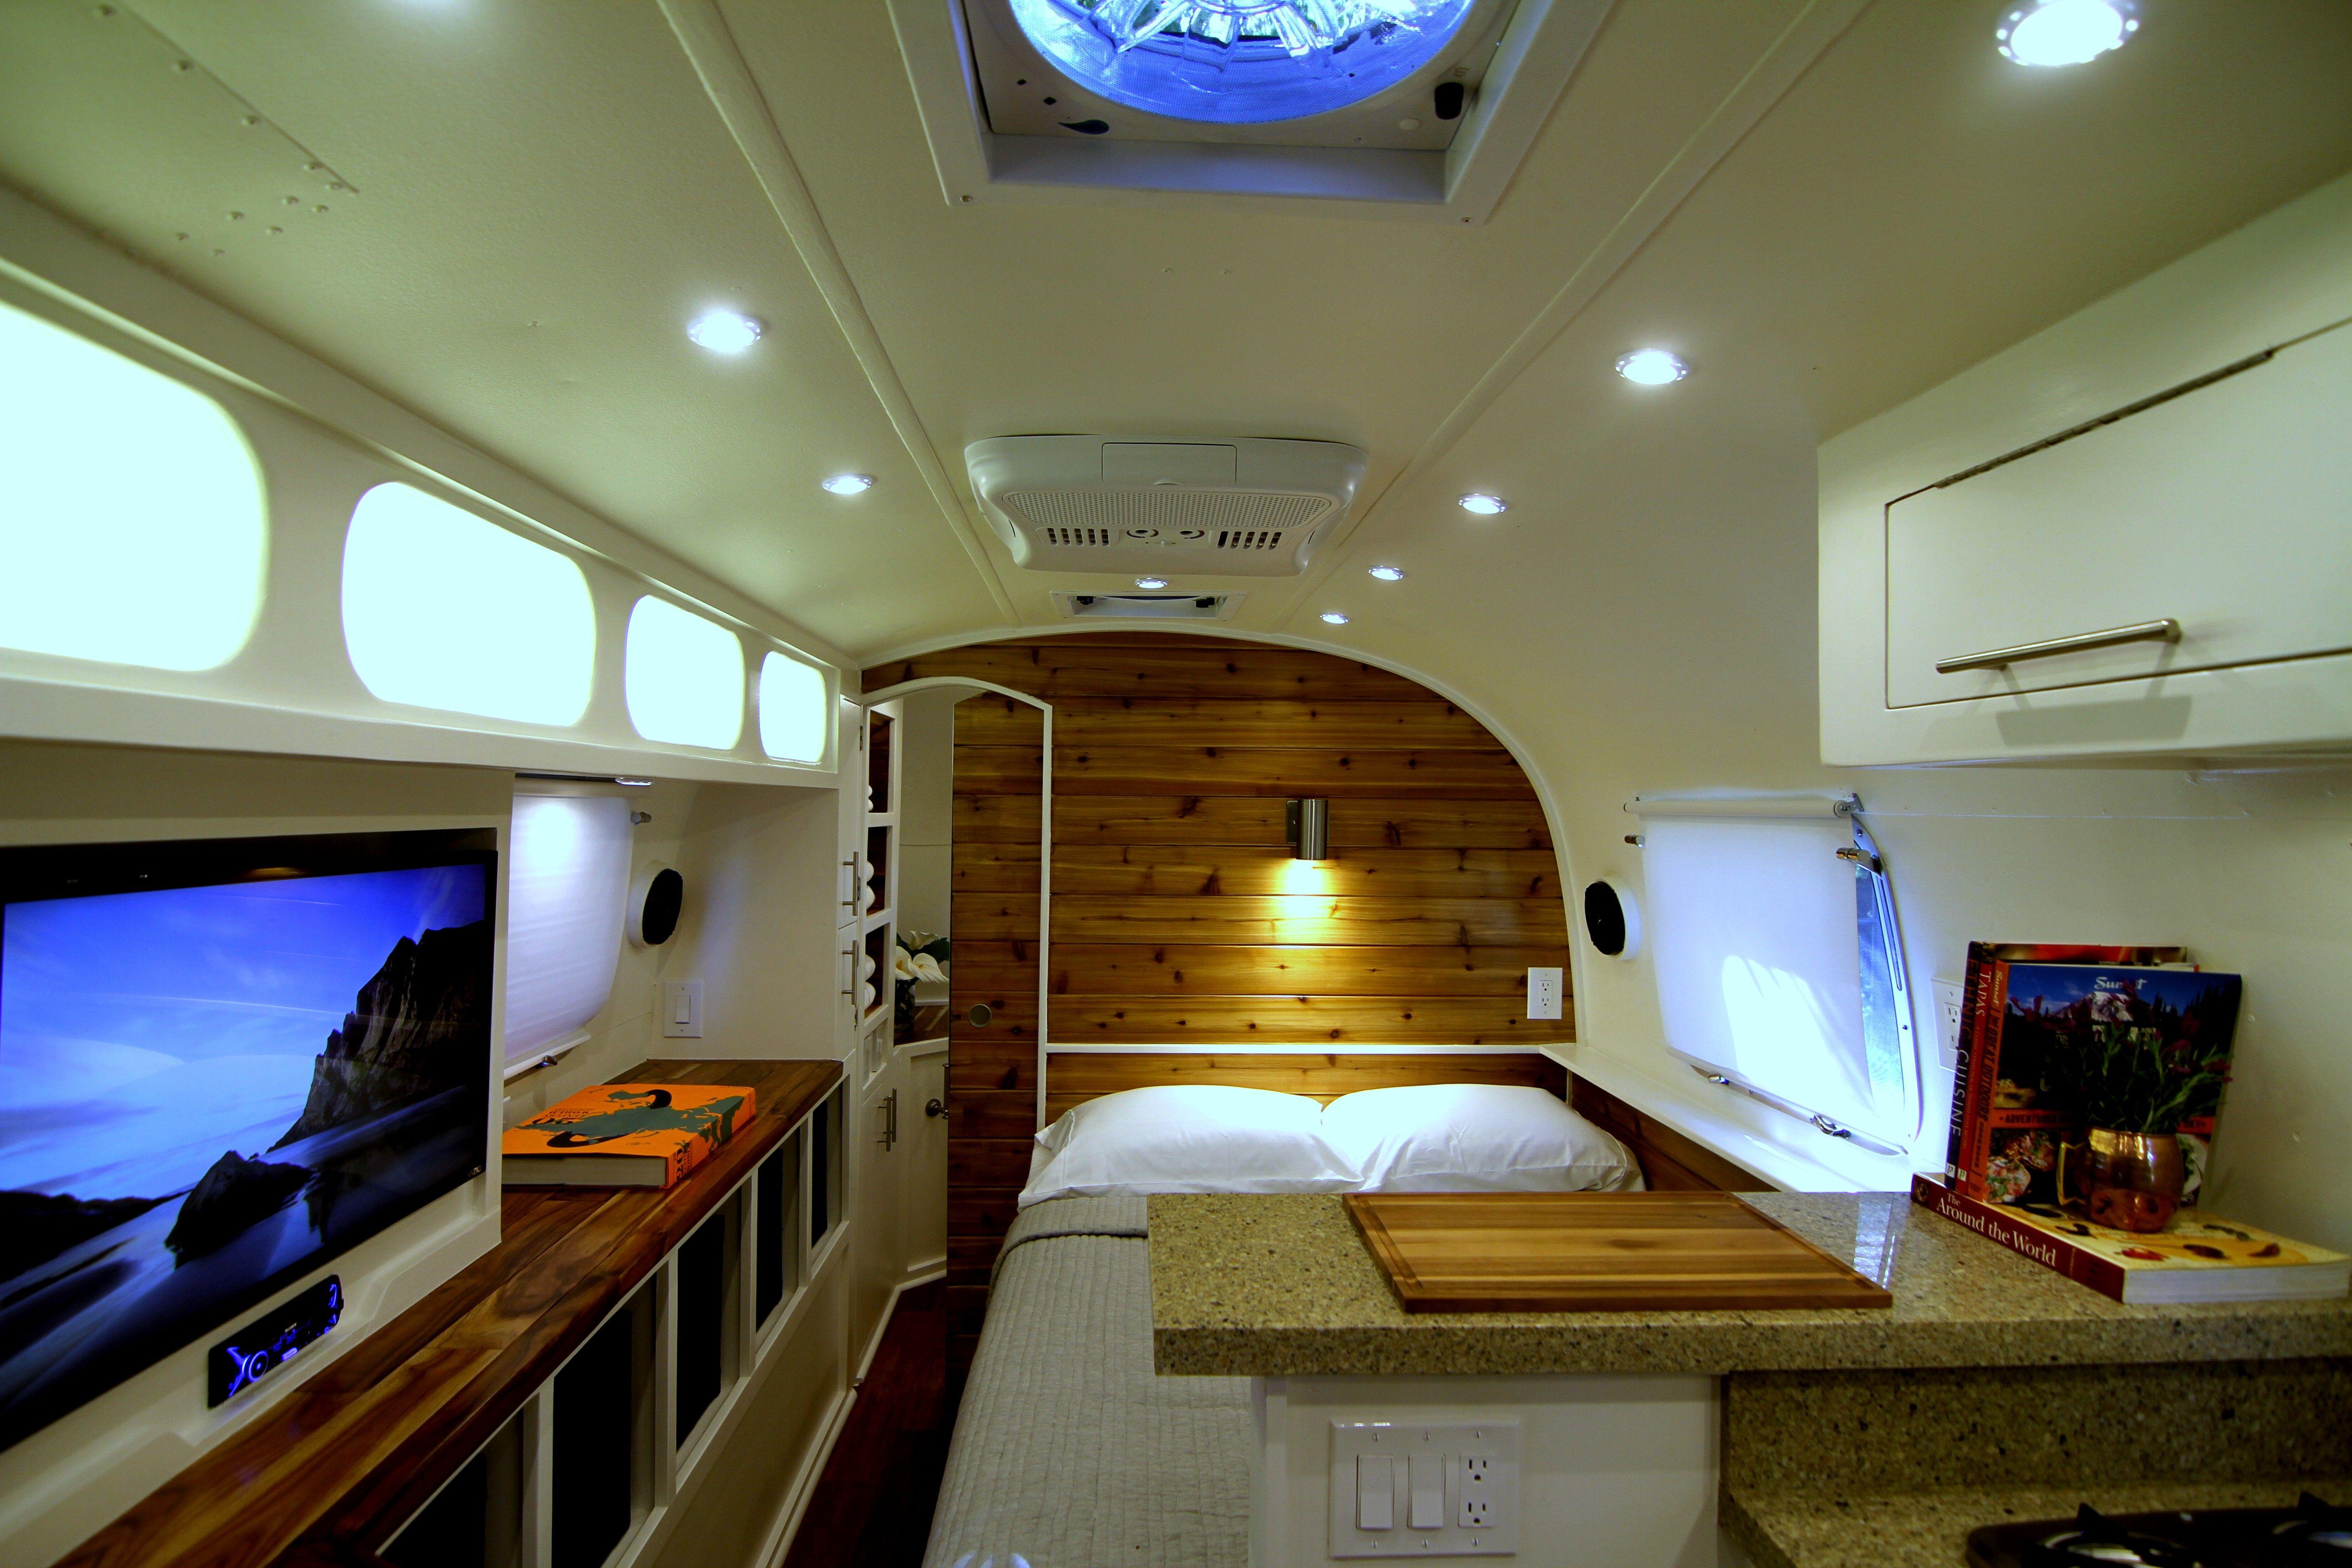 1975 Airstream Tradewind Airstream Renovation Rv Living Travel Trailer Remodel